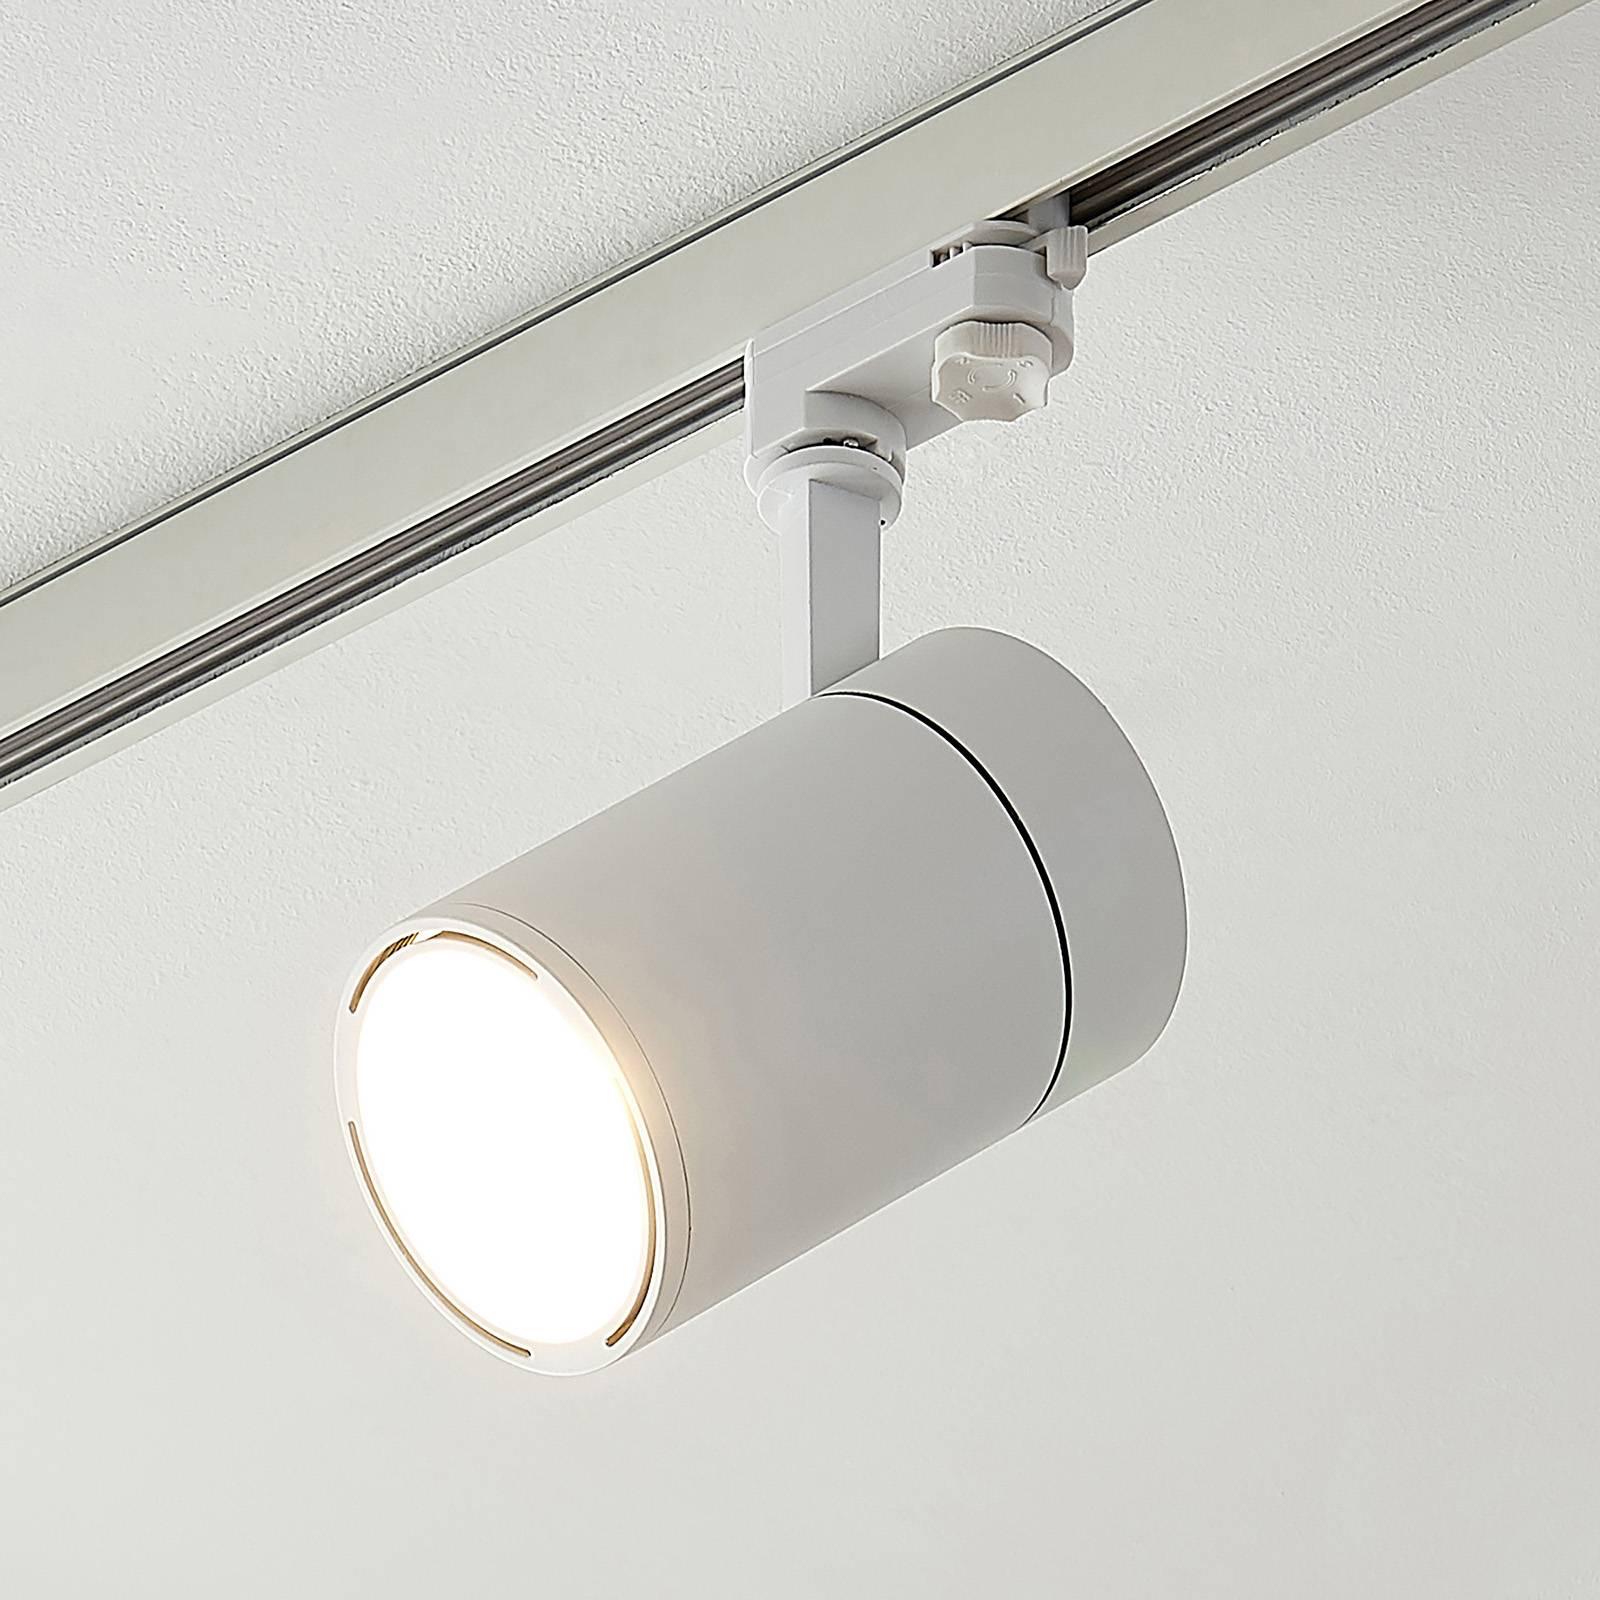 Arcchio Cady LED-kiskovalaisin, valkoinen 36° 31W